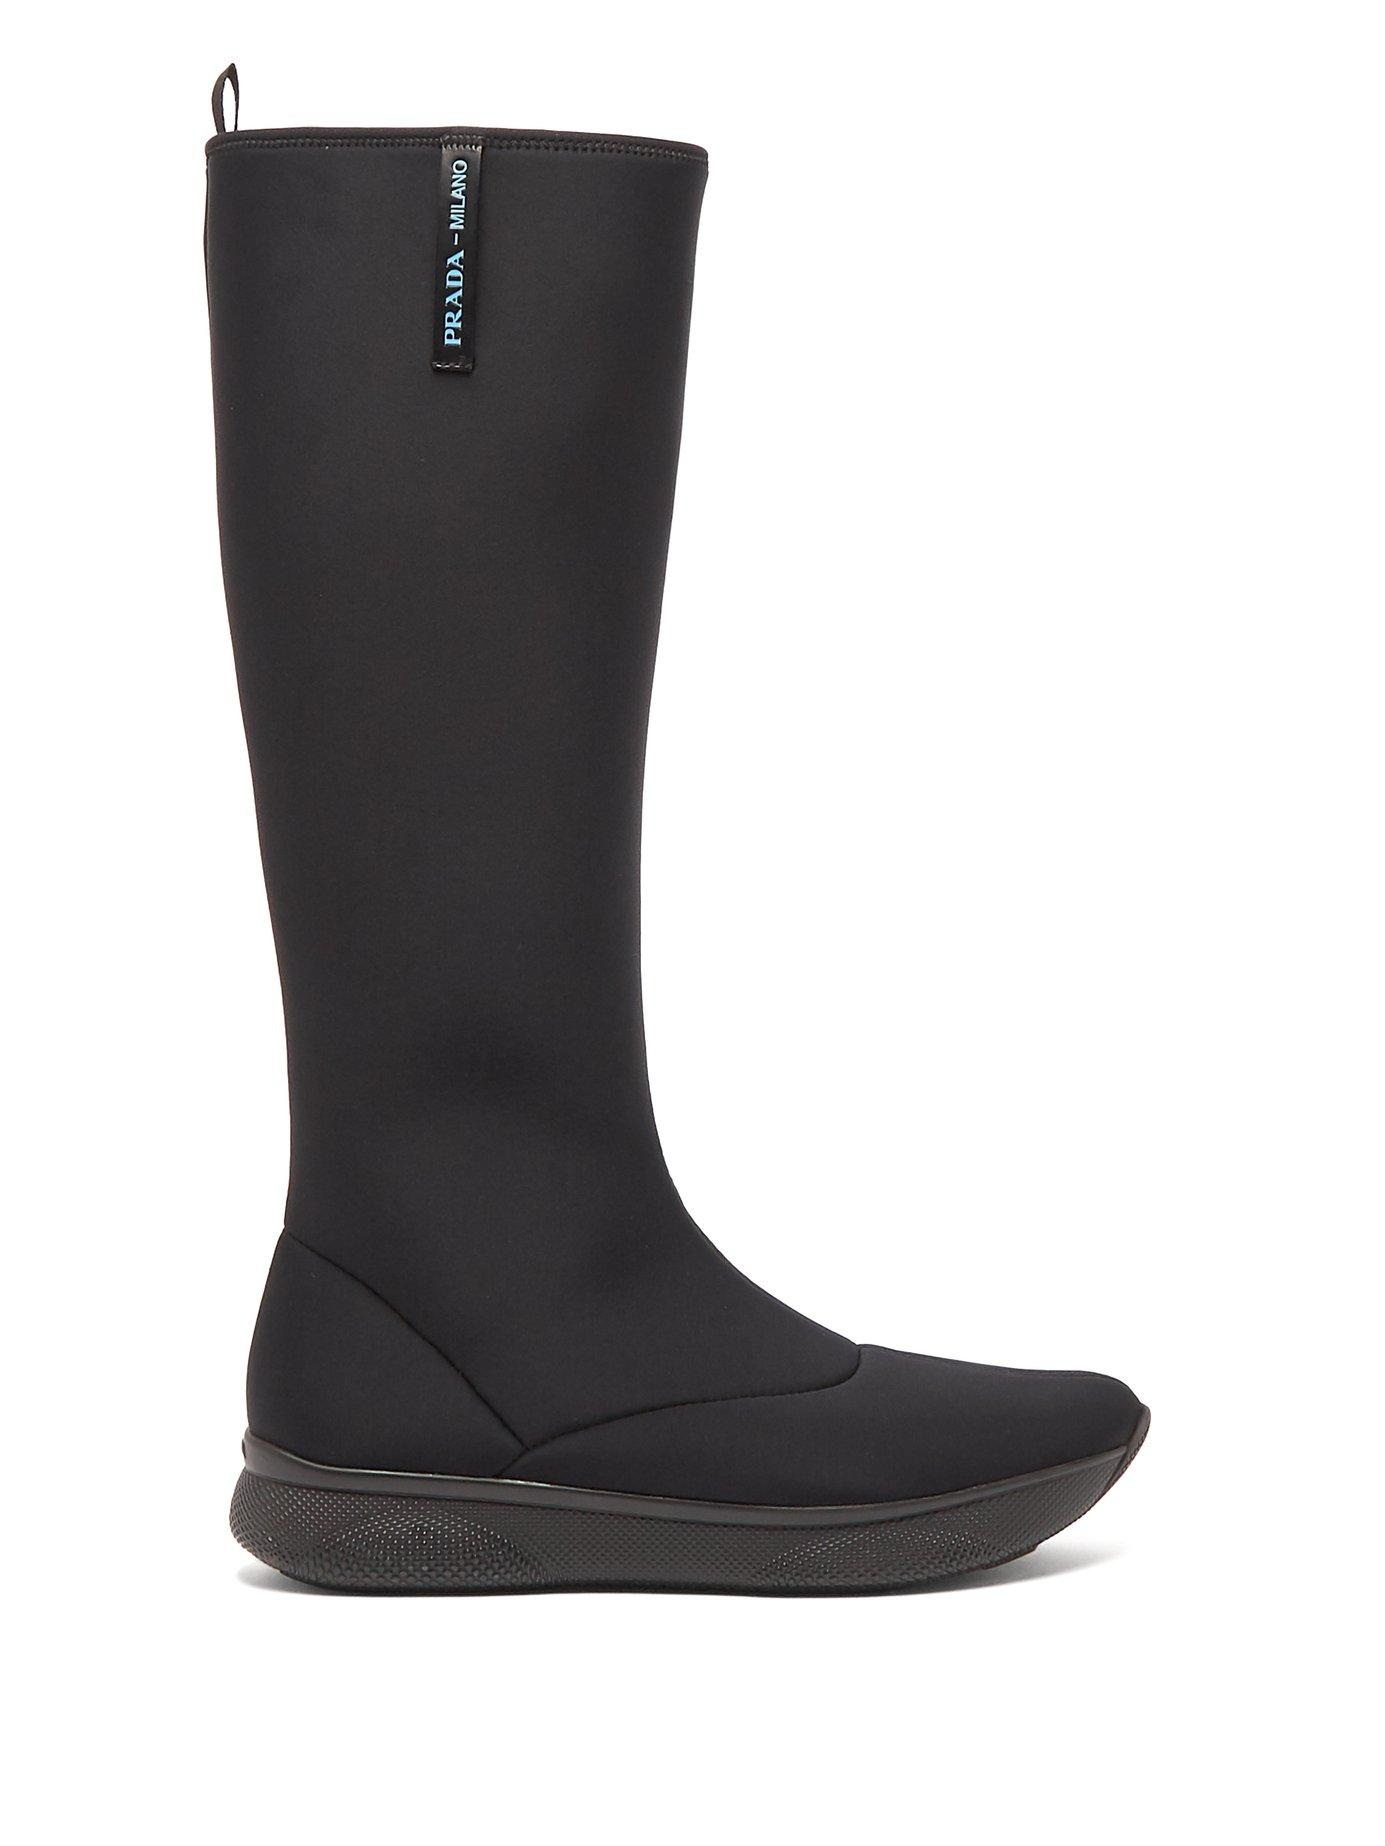 Prada Neoprene Knee-High Boots In Black